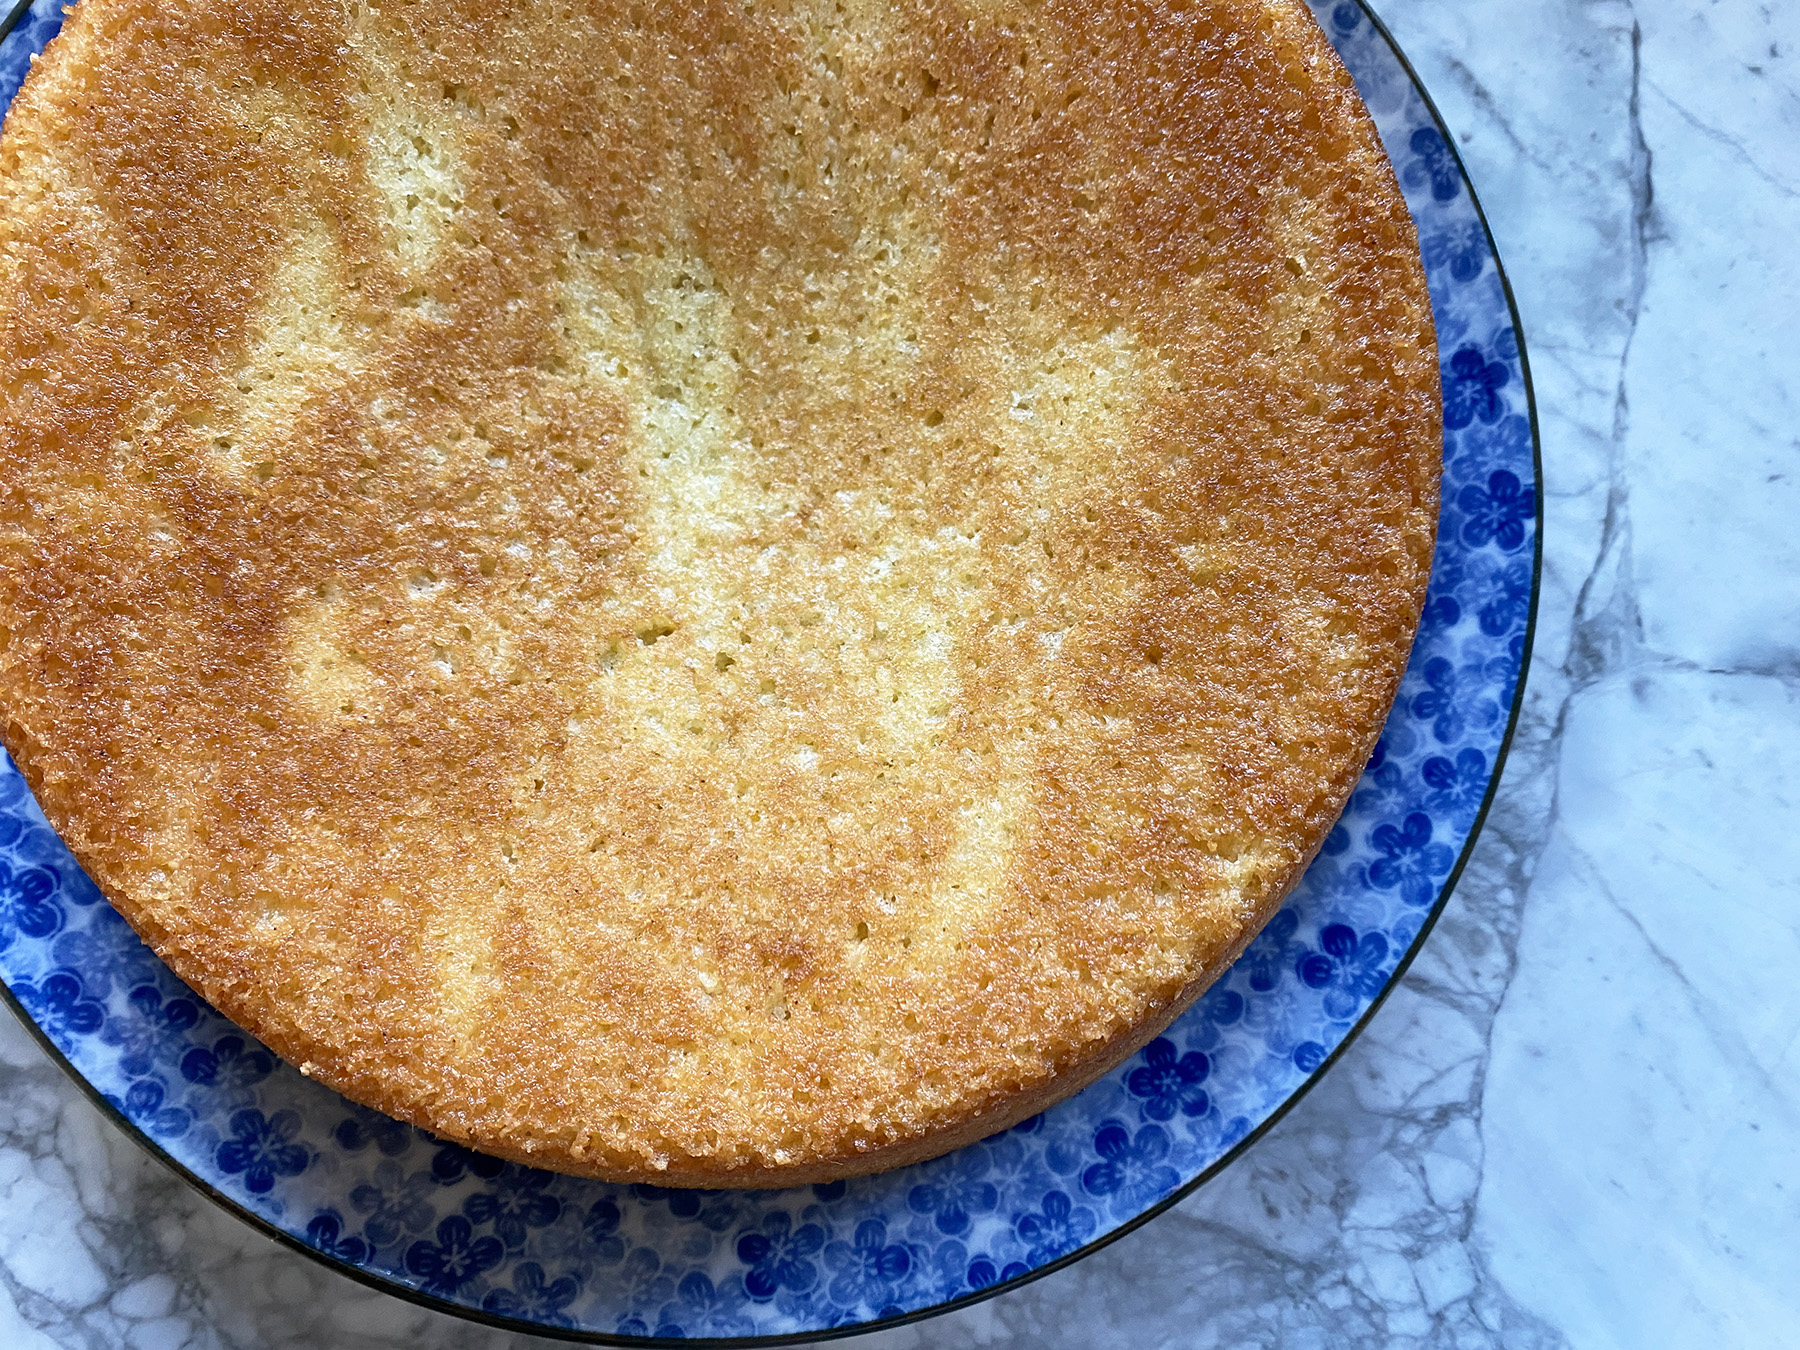 Lemon Almond Cake (Gluten-Free)